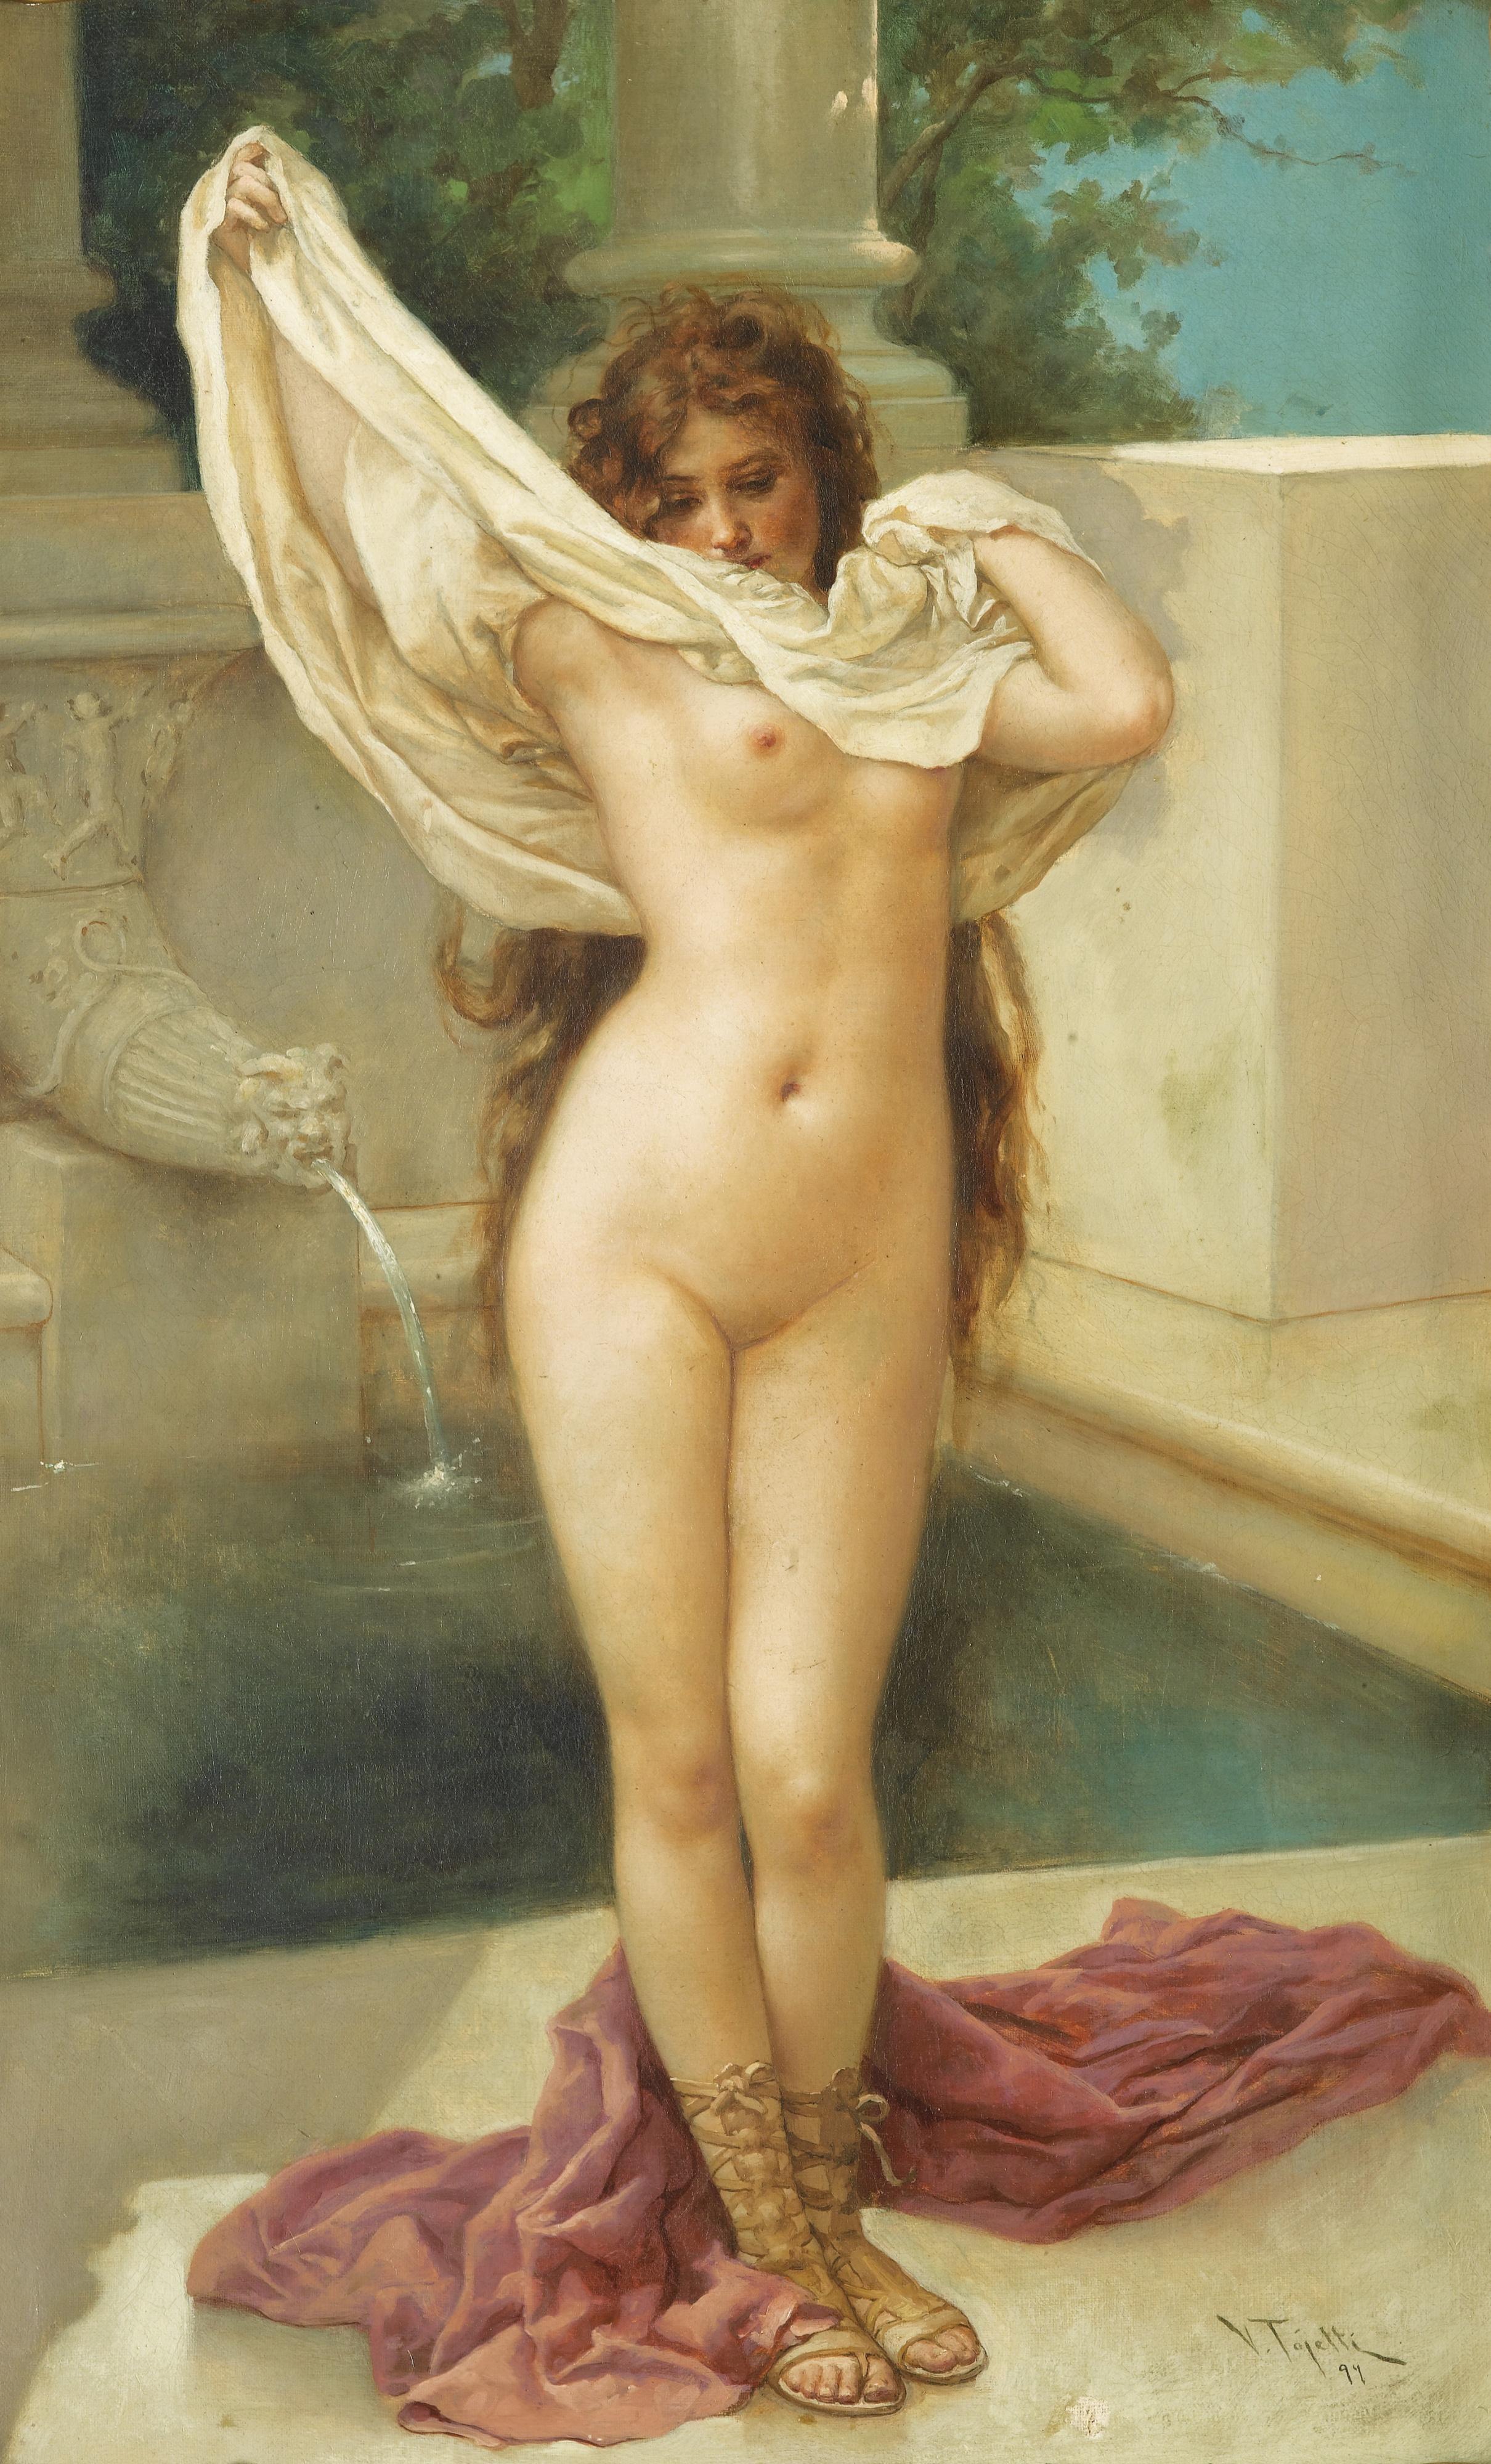 Virgilio Tojetti, 1851-1901. Время купания. 867.5 х 41 см.